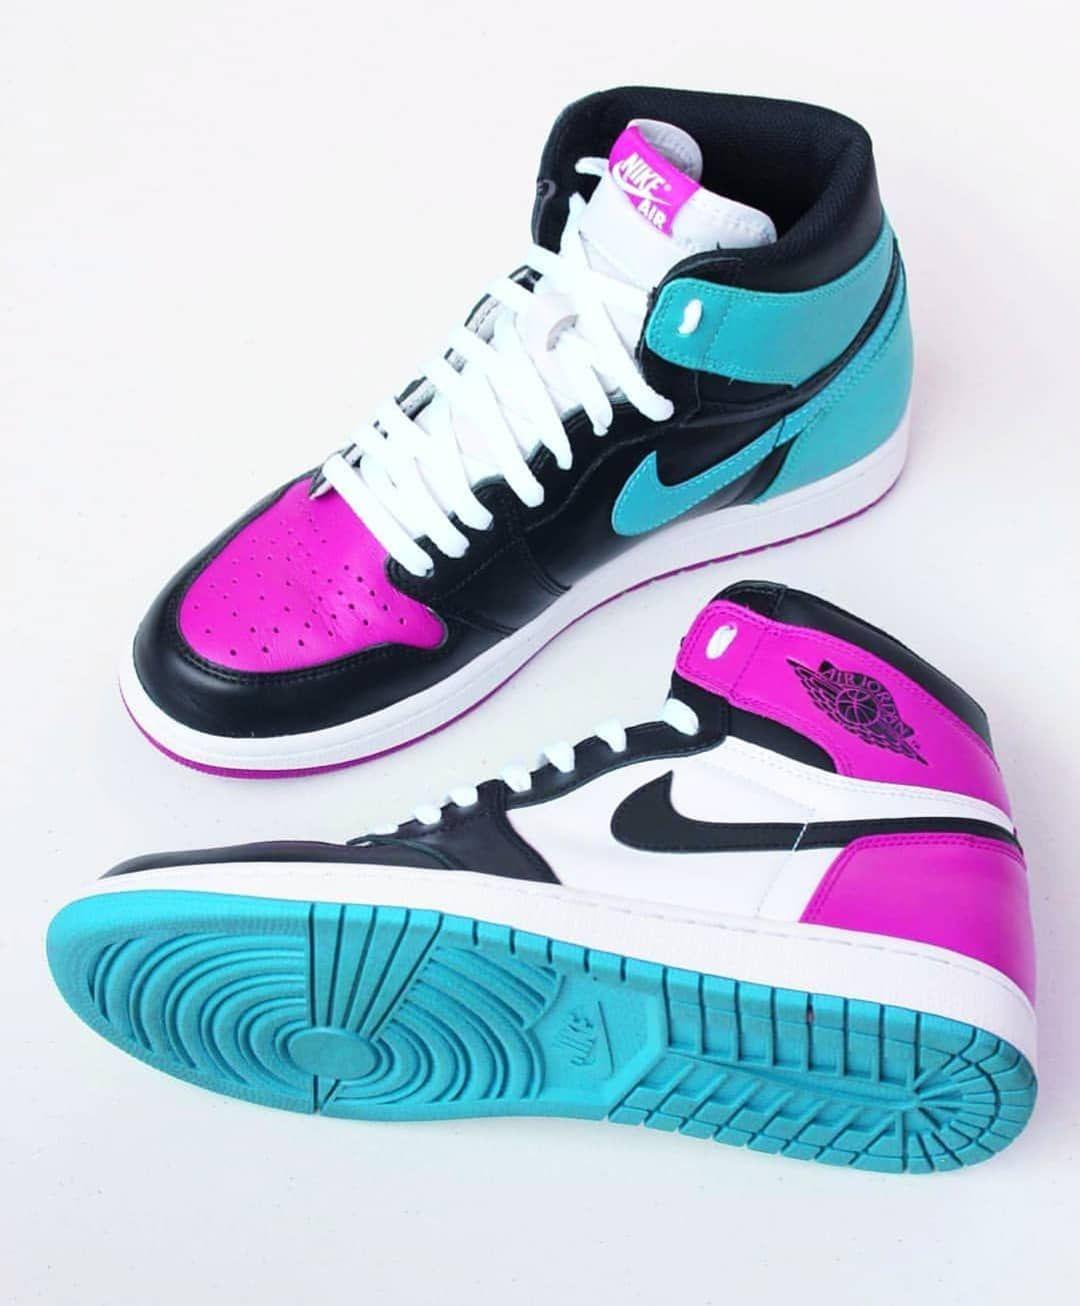 Pin By Carmenn On Jordan 1 Black With Images Sneakers